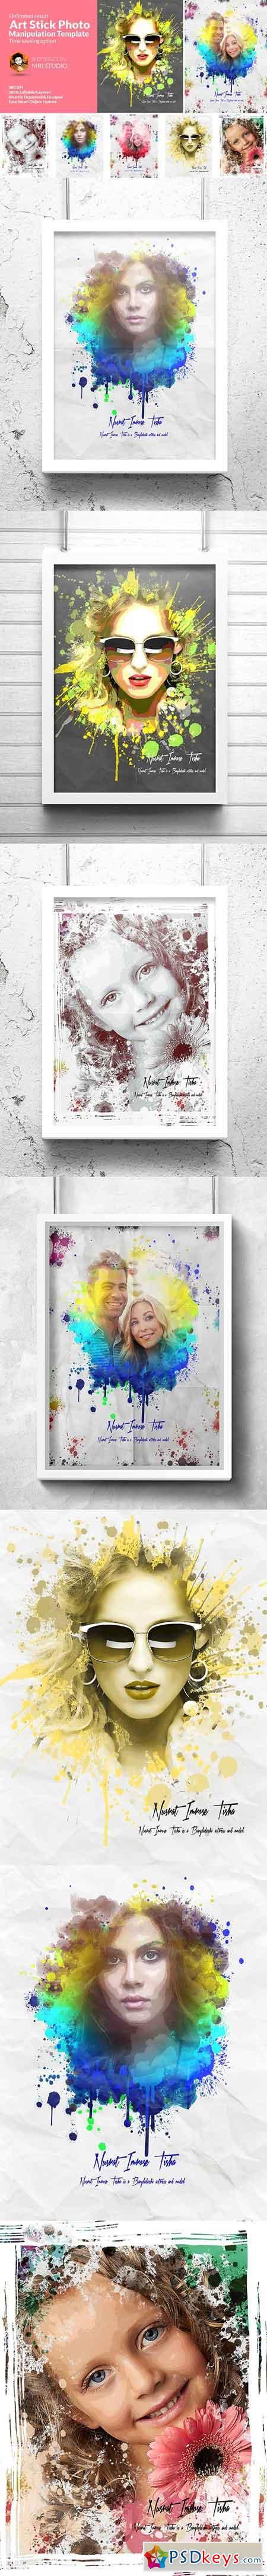 Artistic Photo Manipulation Template 1286680